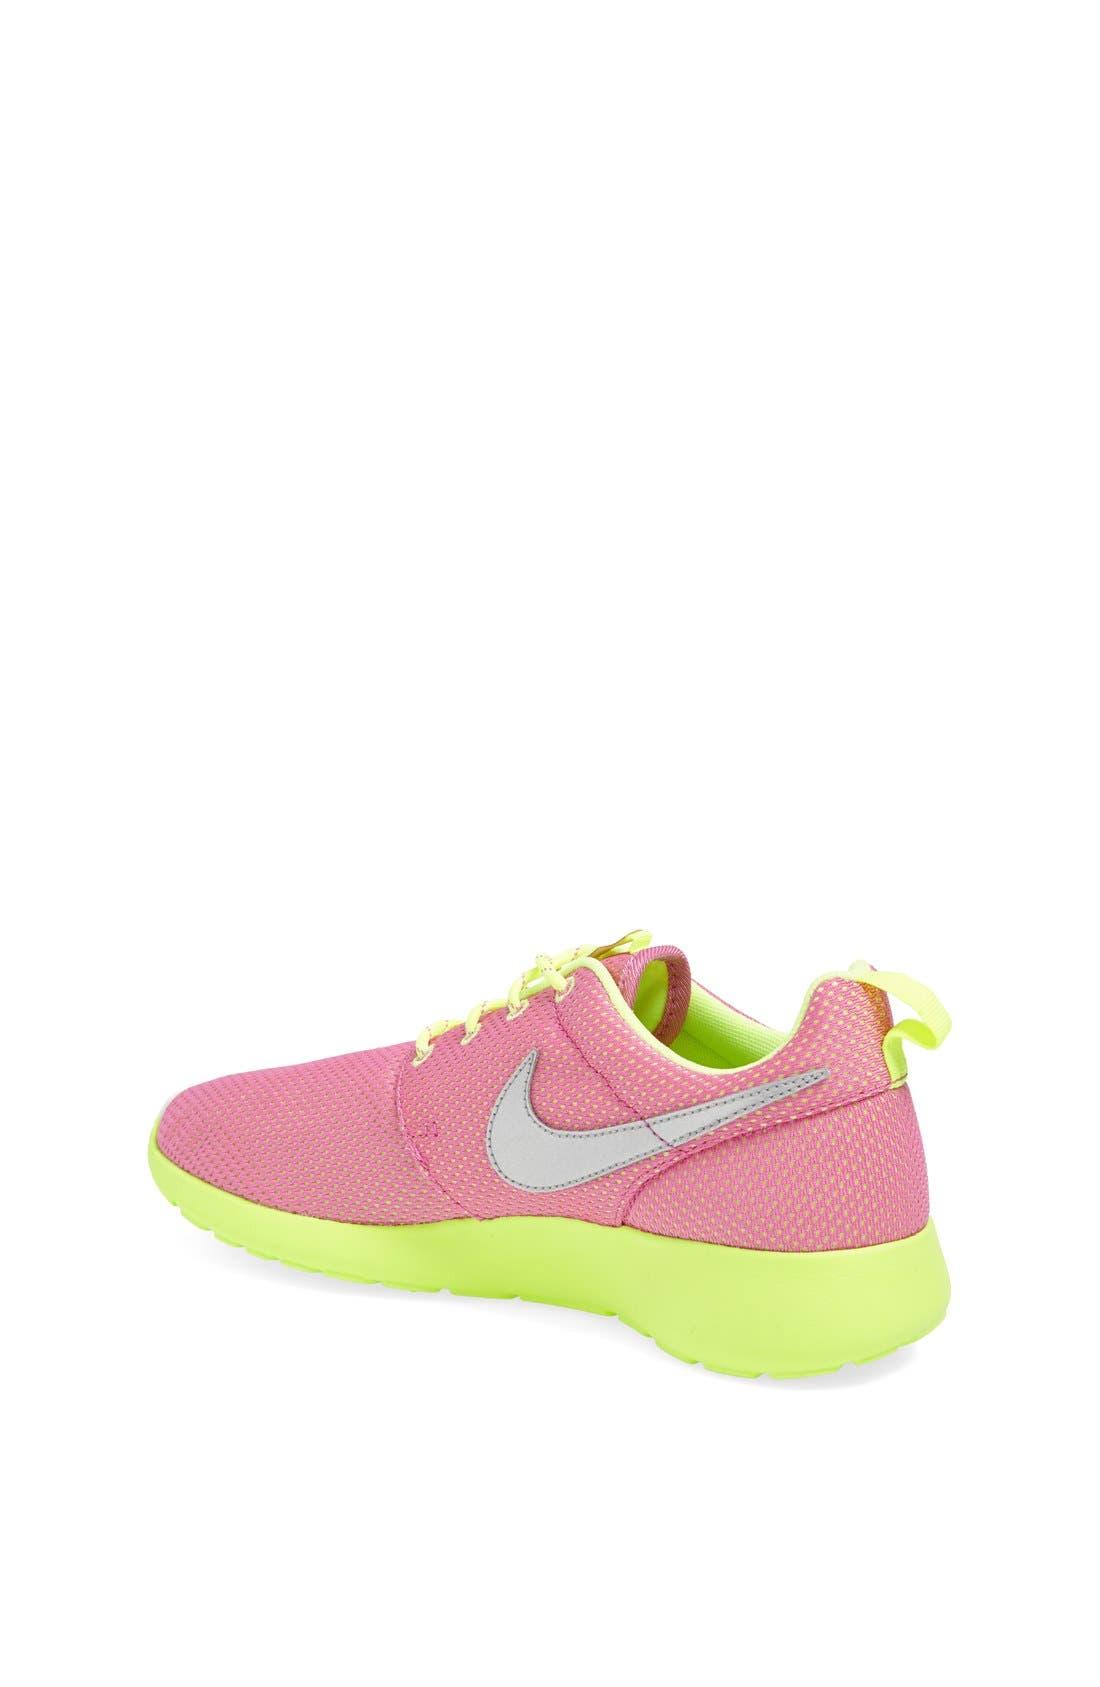 'Roshe Run' Athletic Shoe,                             Alternate thumbnail 176, color,